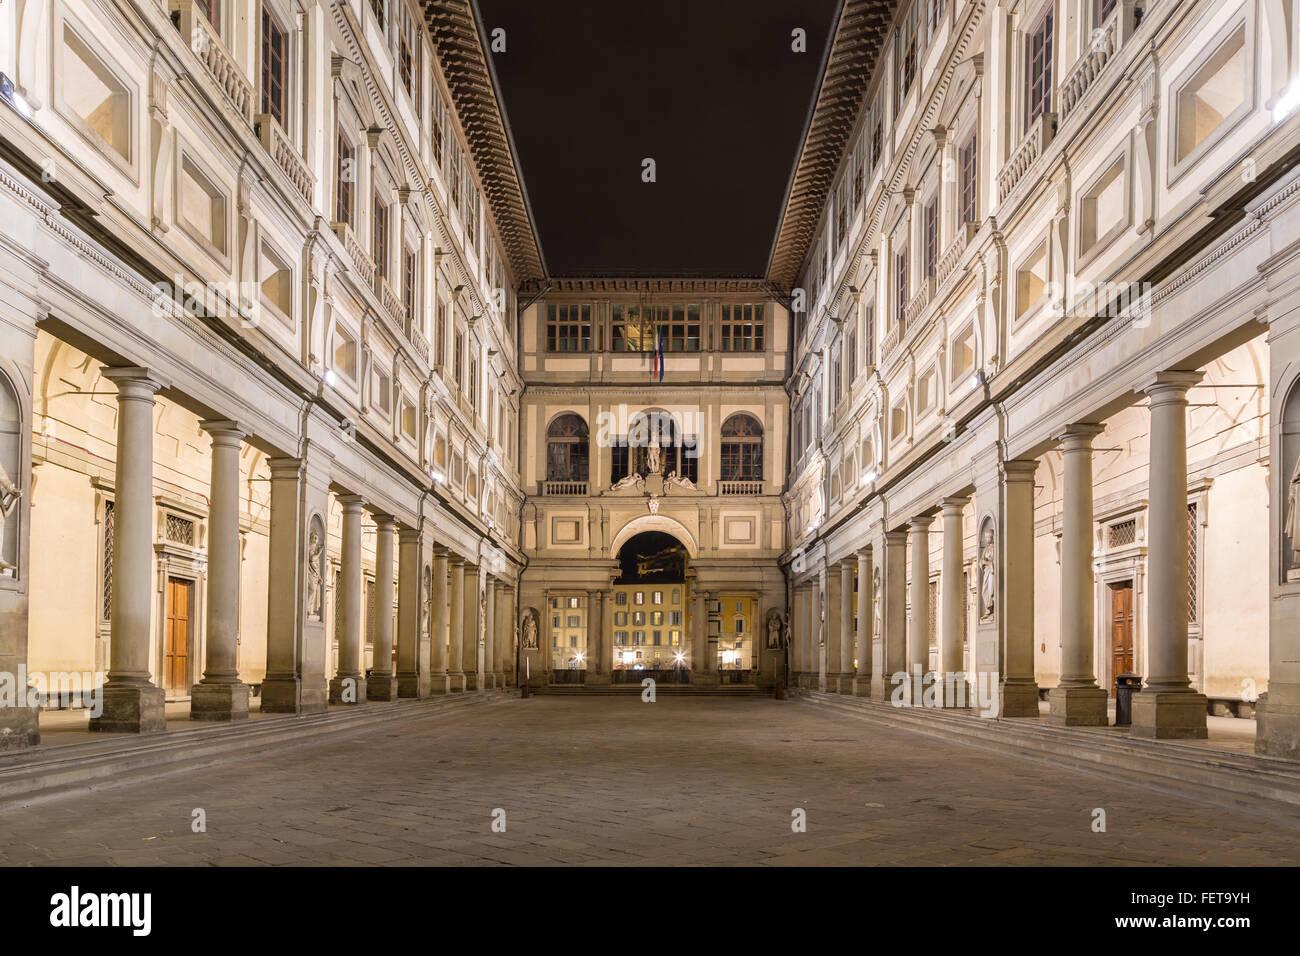 Uffizi Gallery, night, Florence, Tuscany, Italy - Stock Image